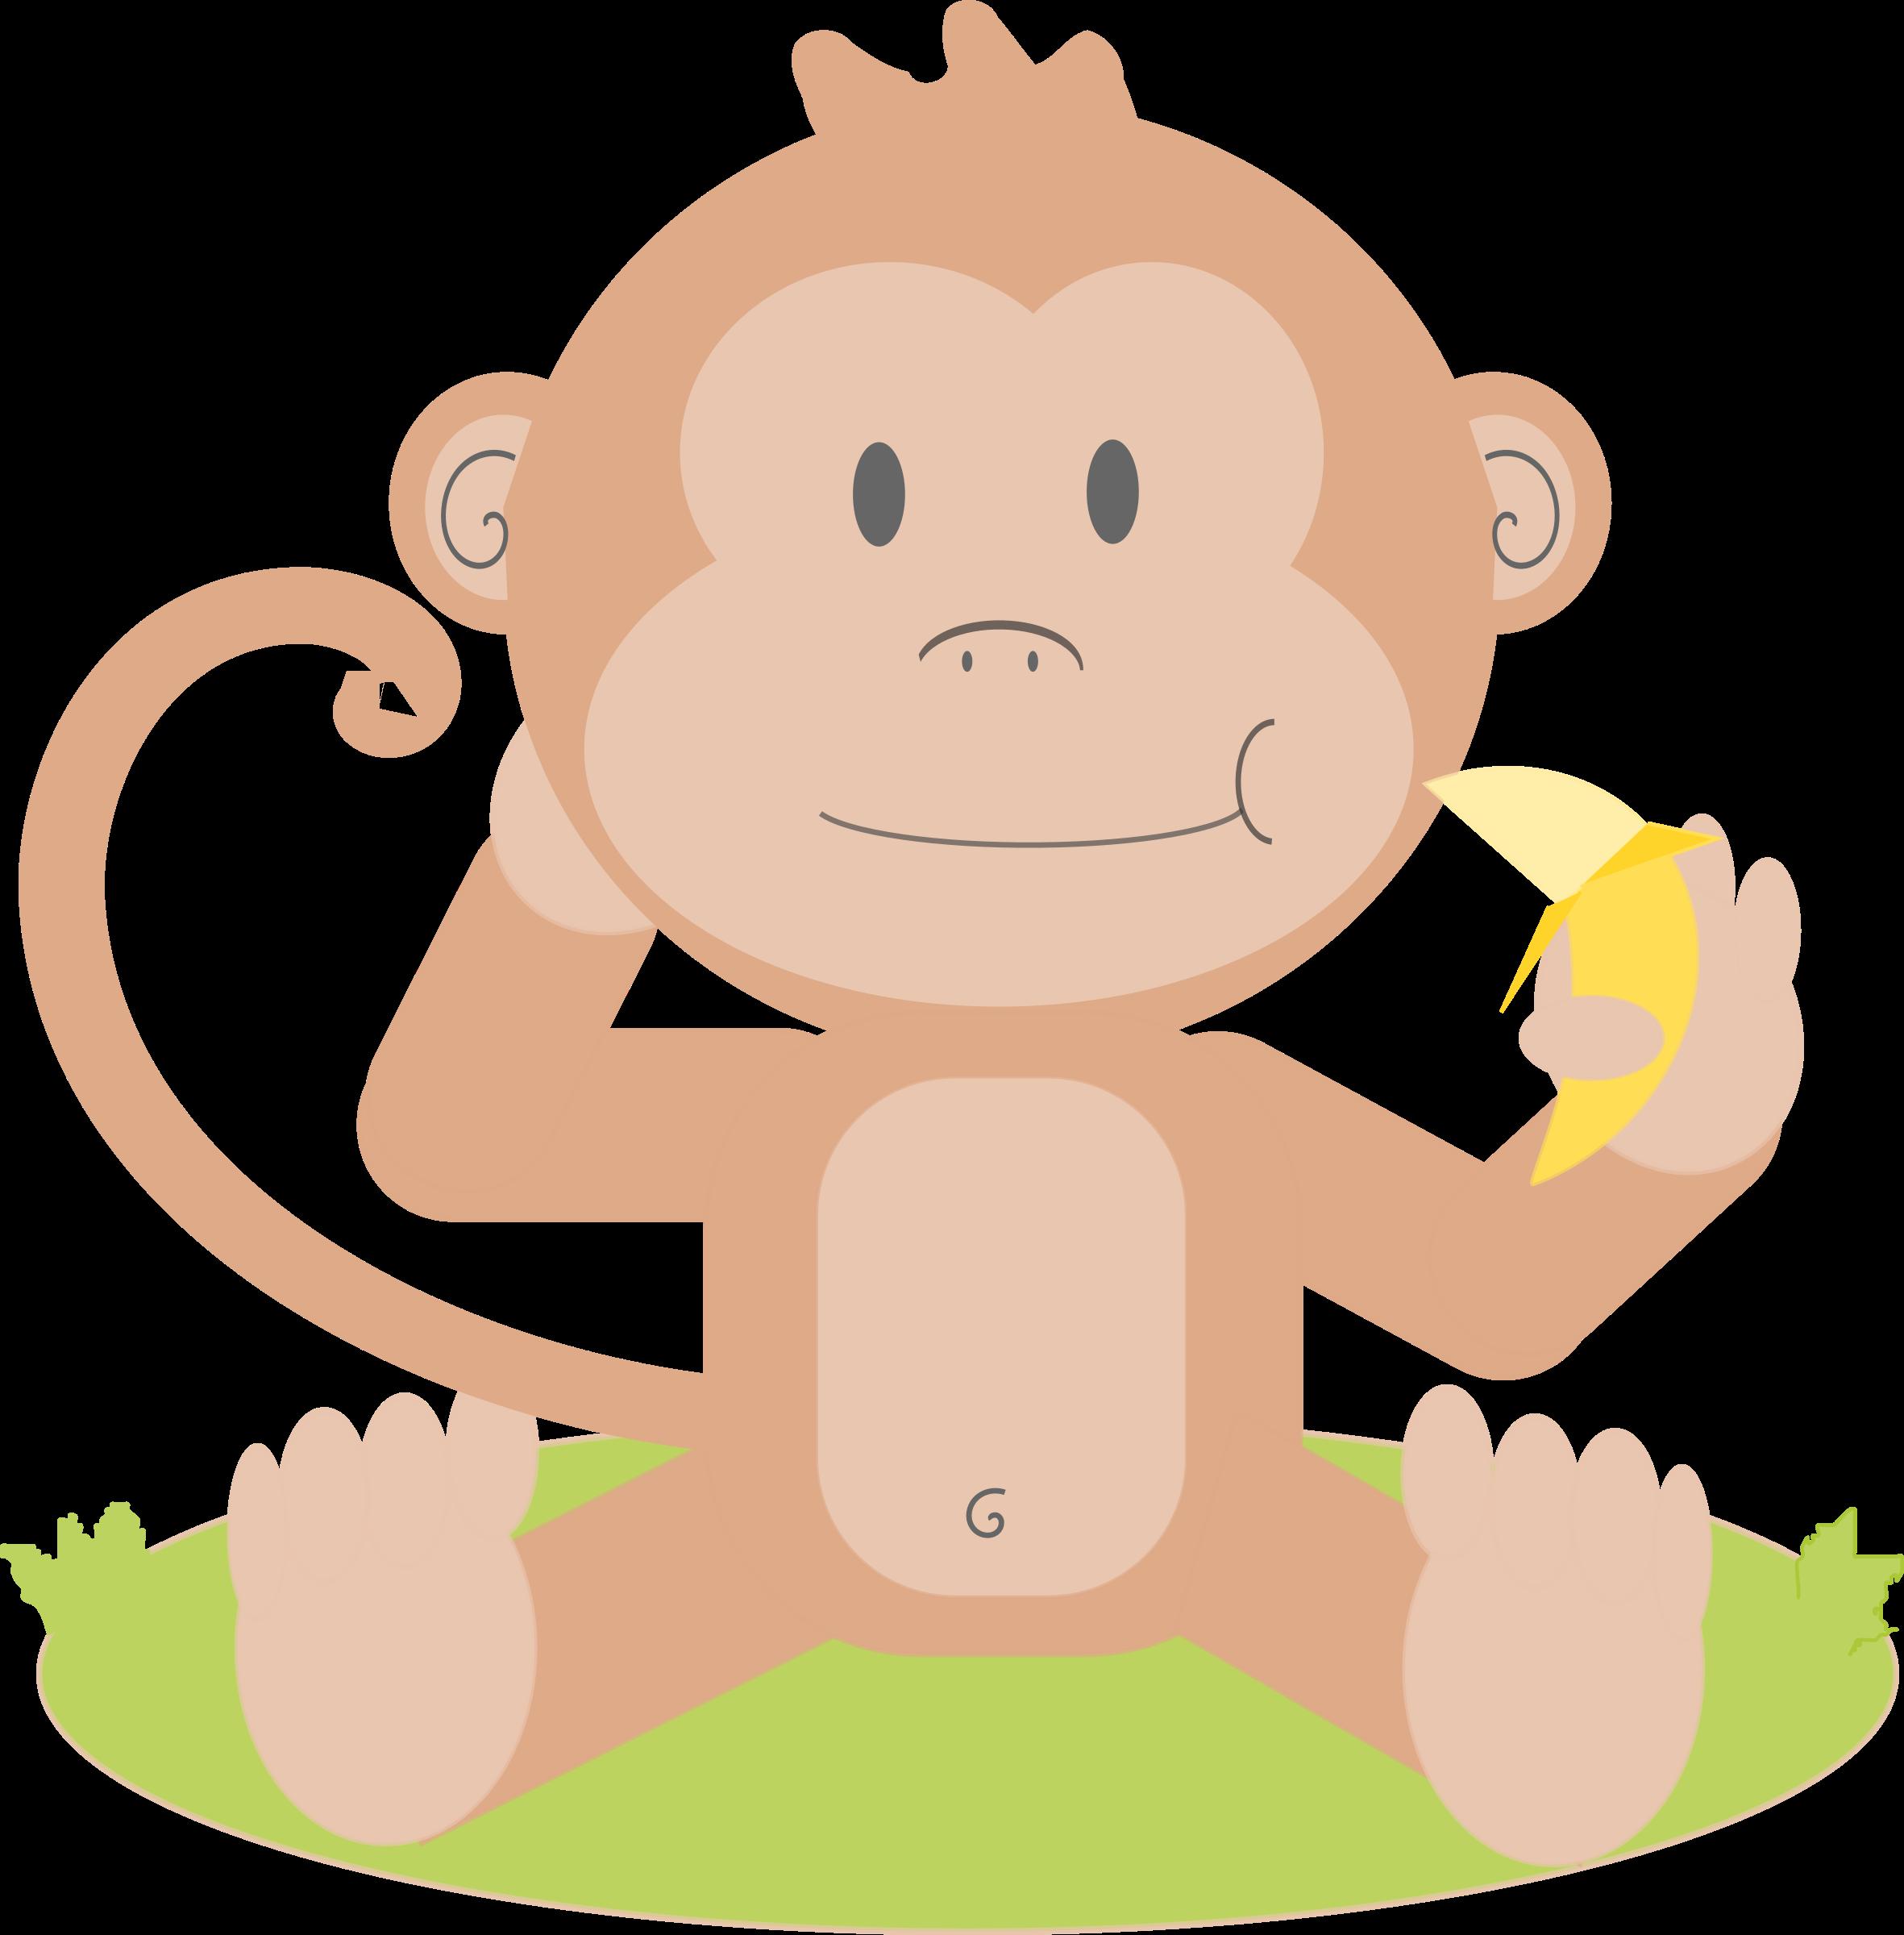 Elephant monkey